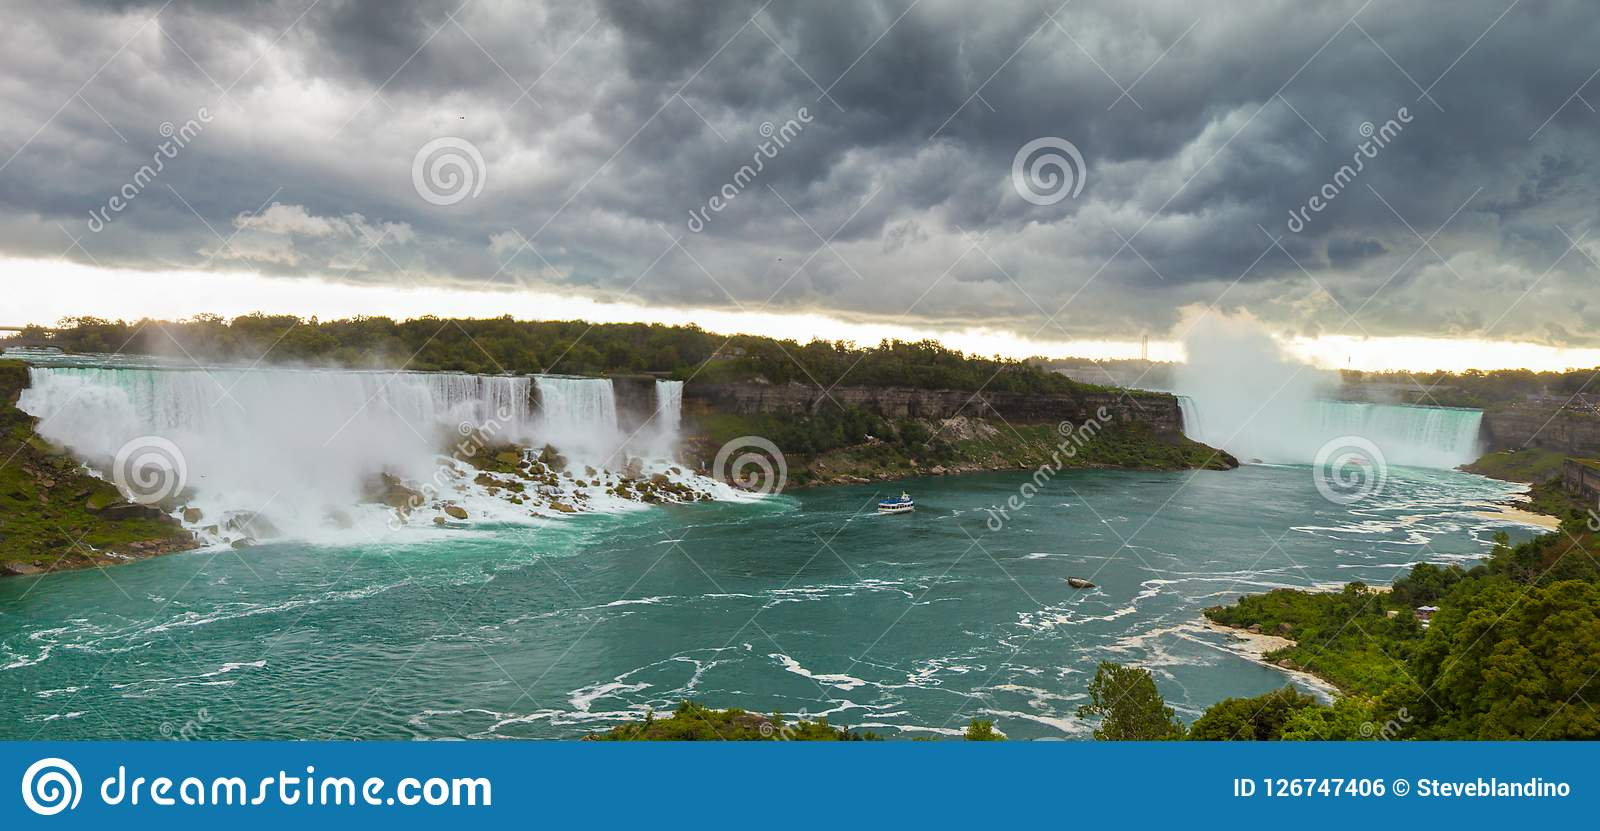 Heavy storm over Niagara falls